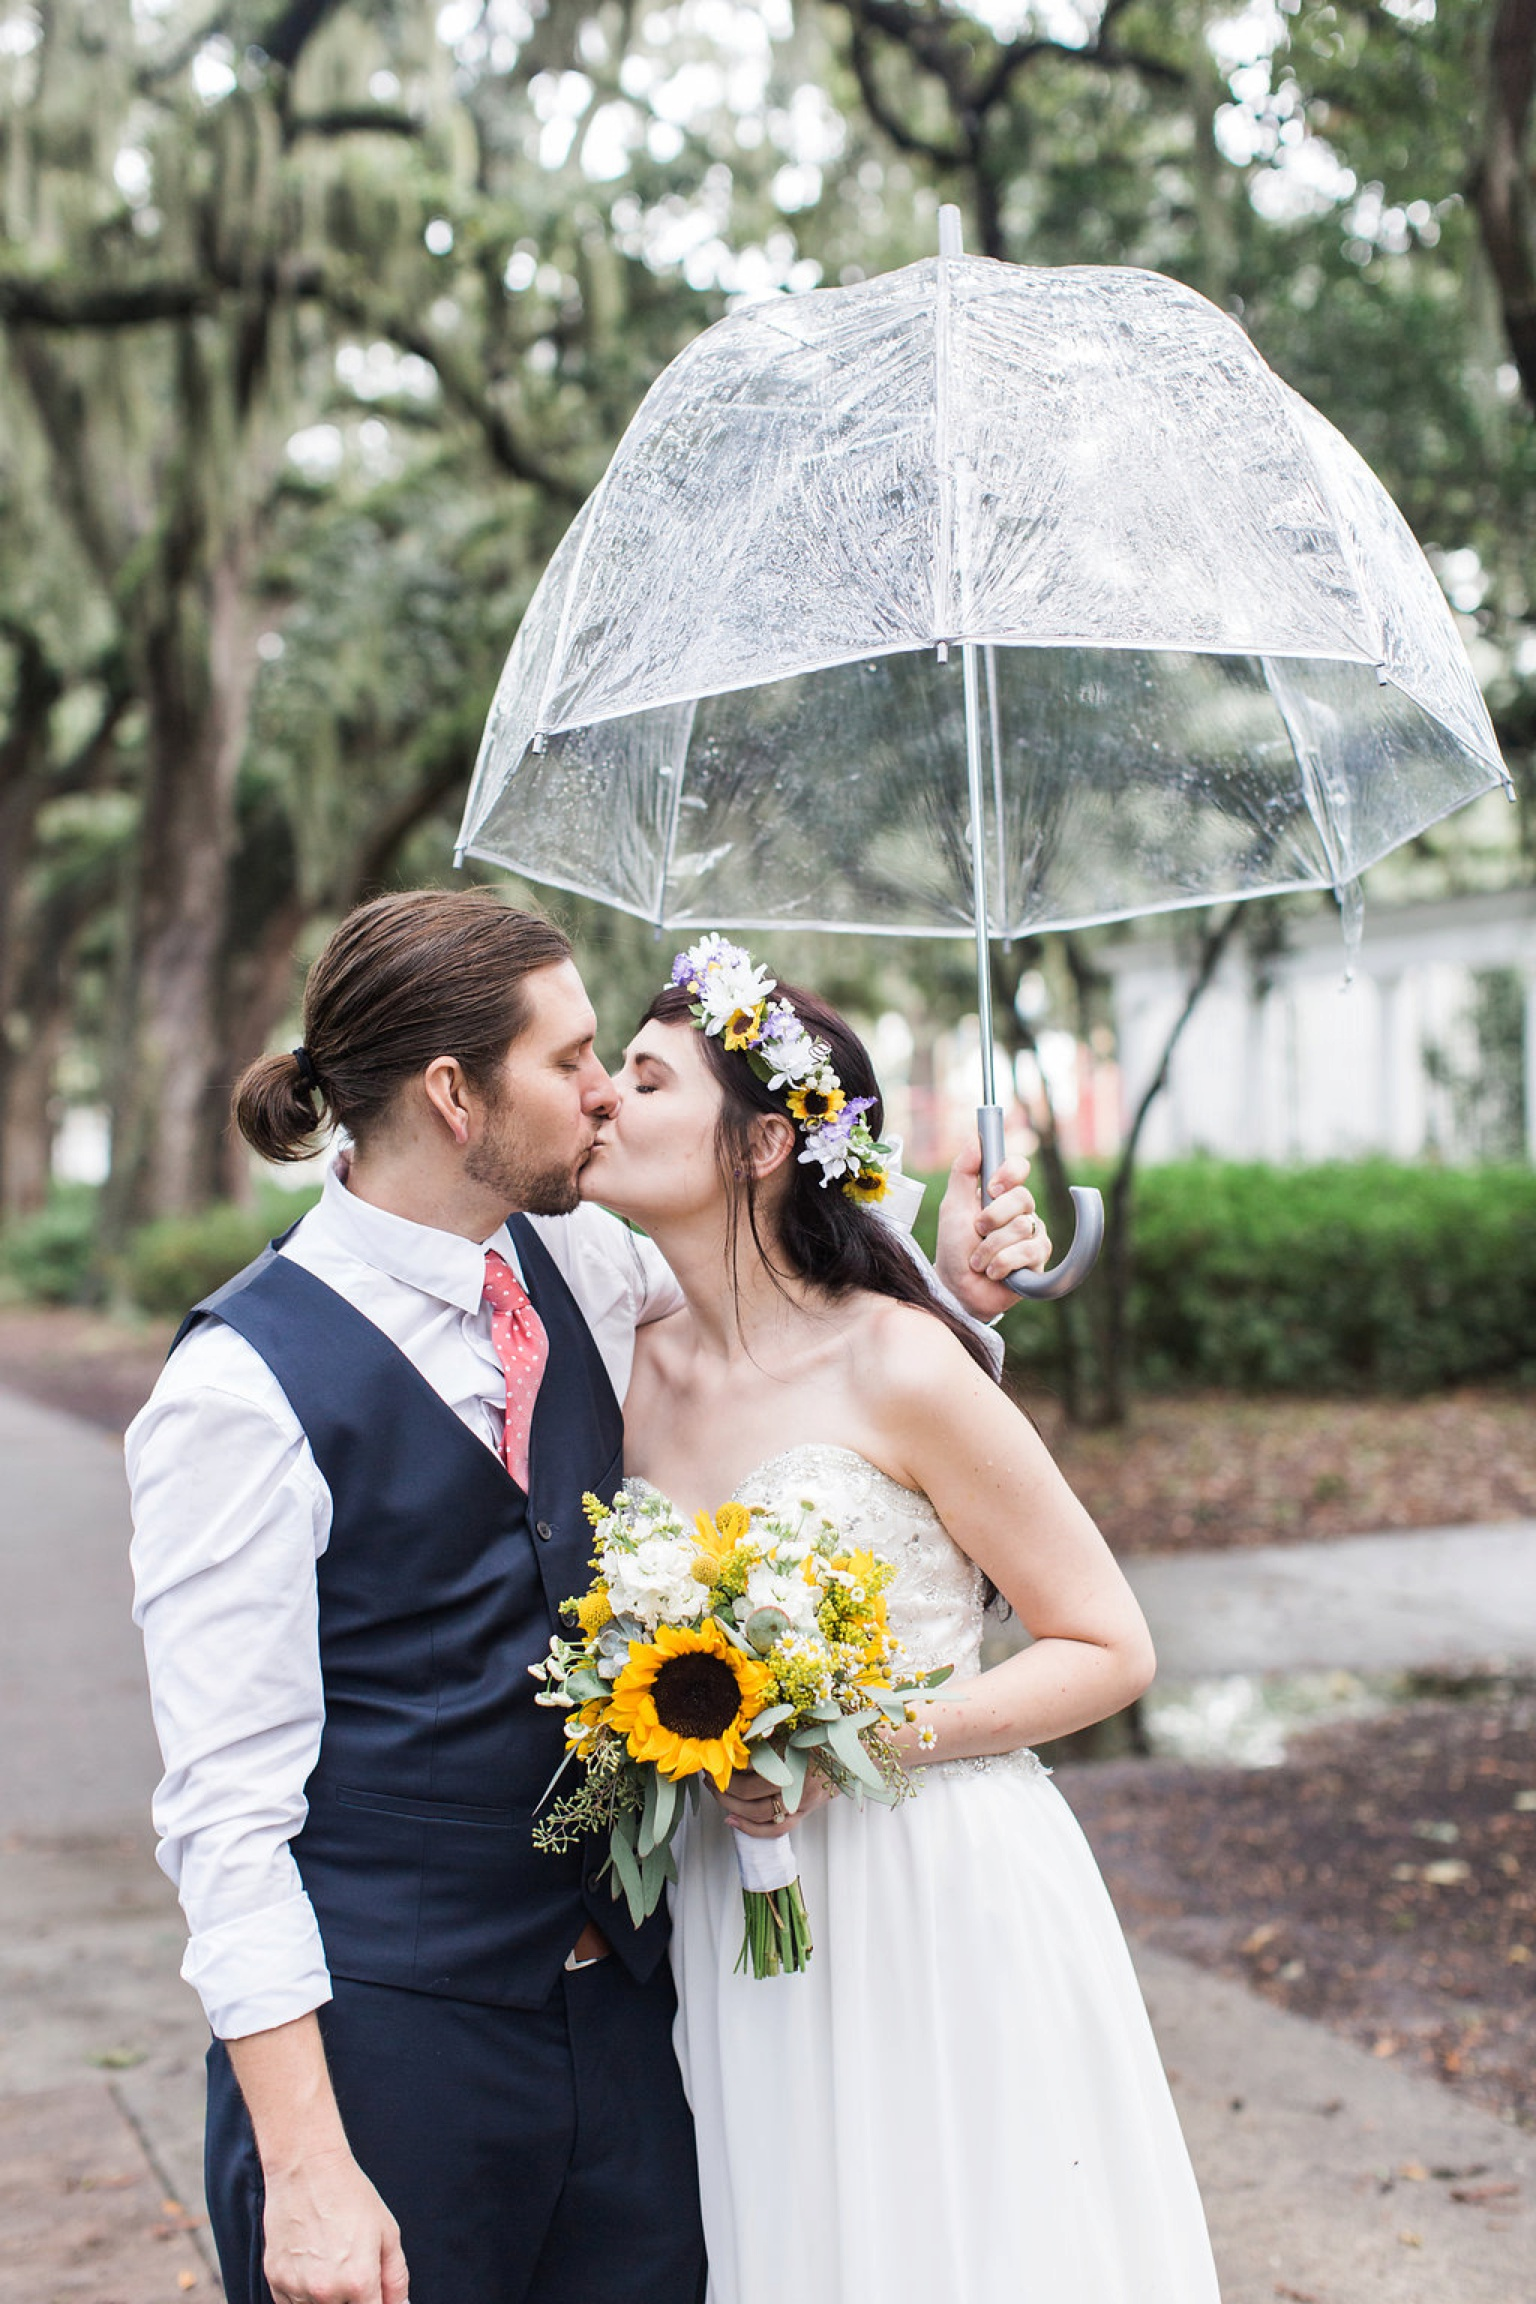 Apt_B_Photo_Savannah_Wedding_Photographer_Flower_Crown064.JPG